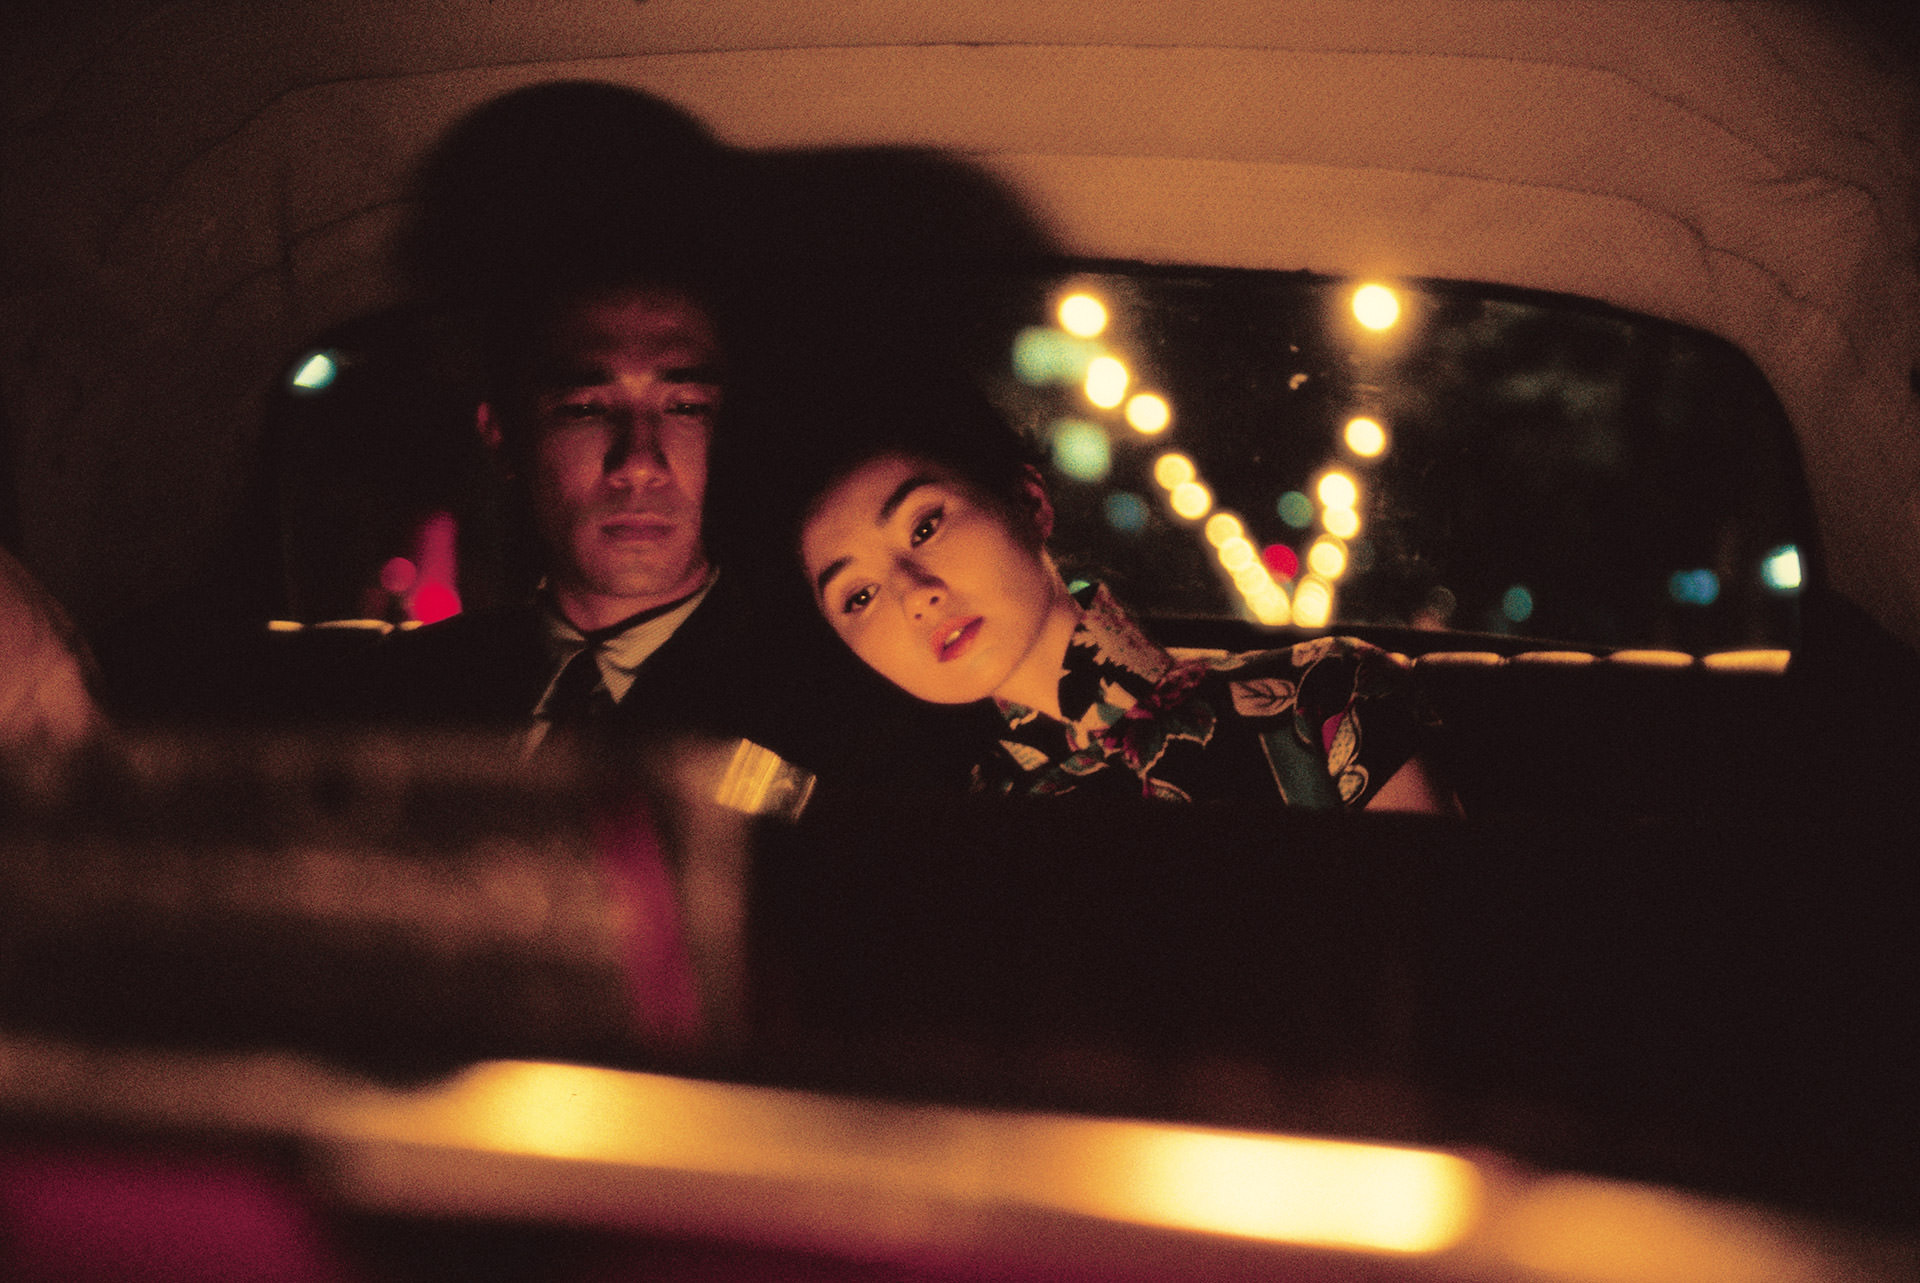 mood-love-tony-leung-maggie-cheung